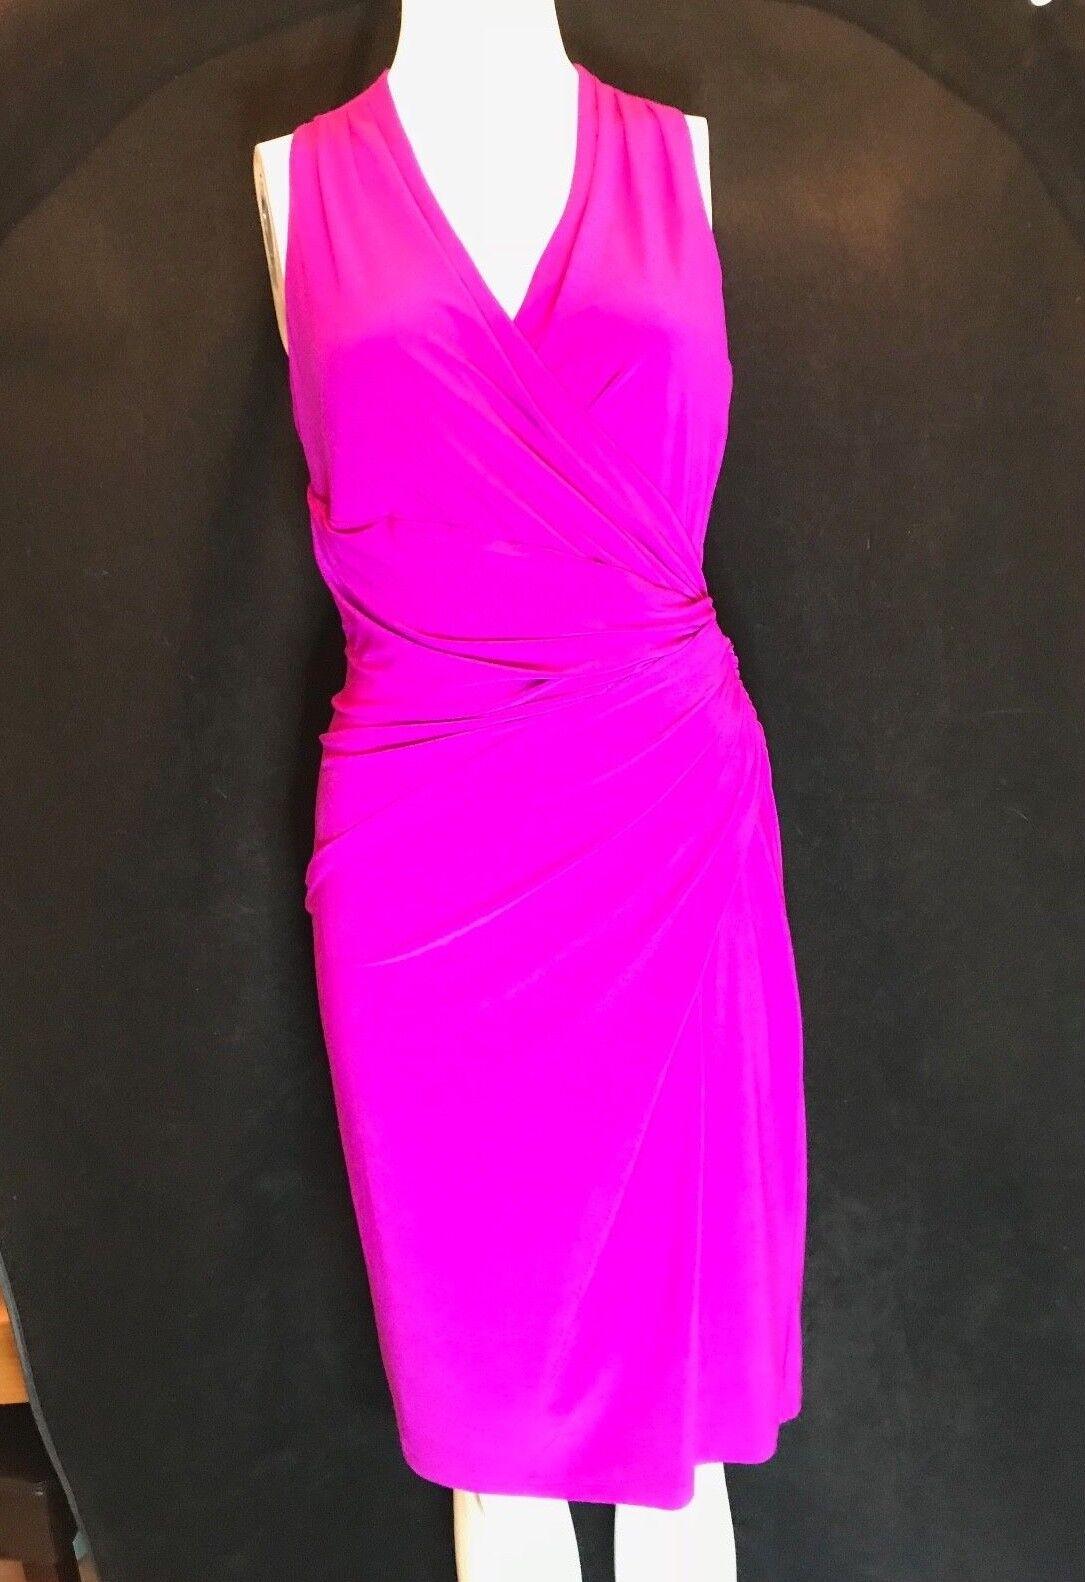 BNWT RALPH LAUREN Cosmopolitan Rosa Sleeveless Bodycon Dress Größe UK S Ralph 6